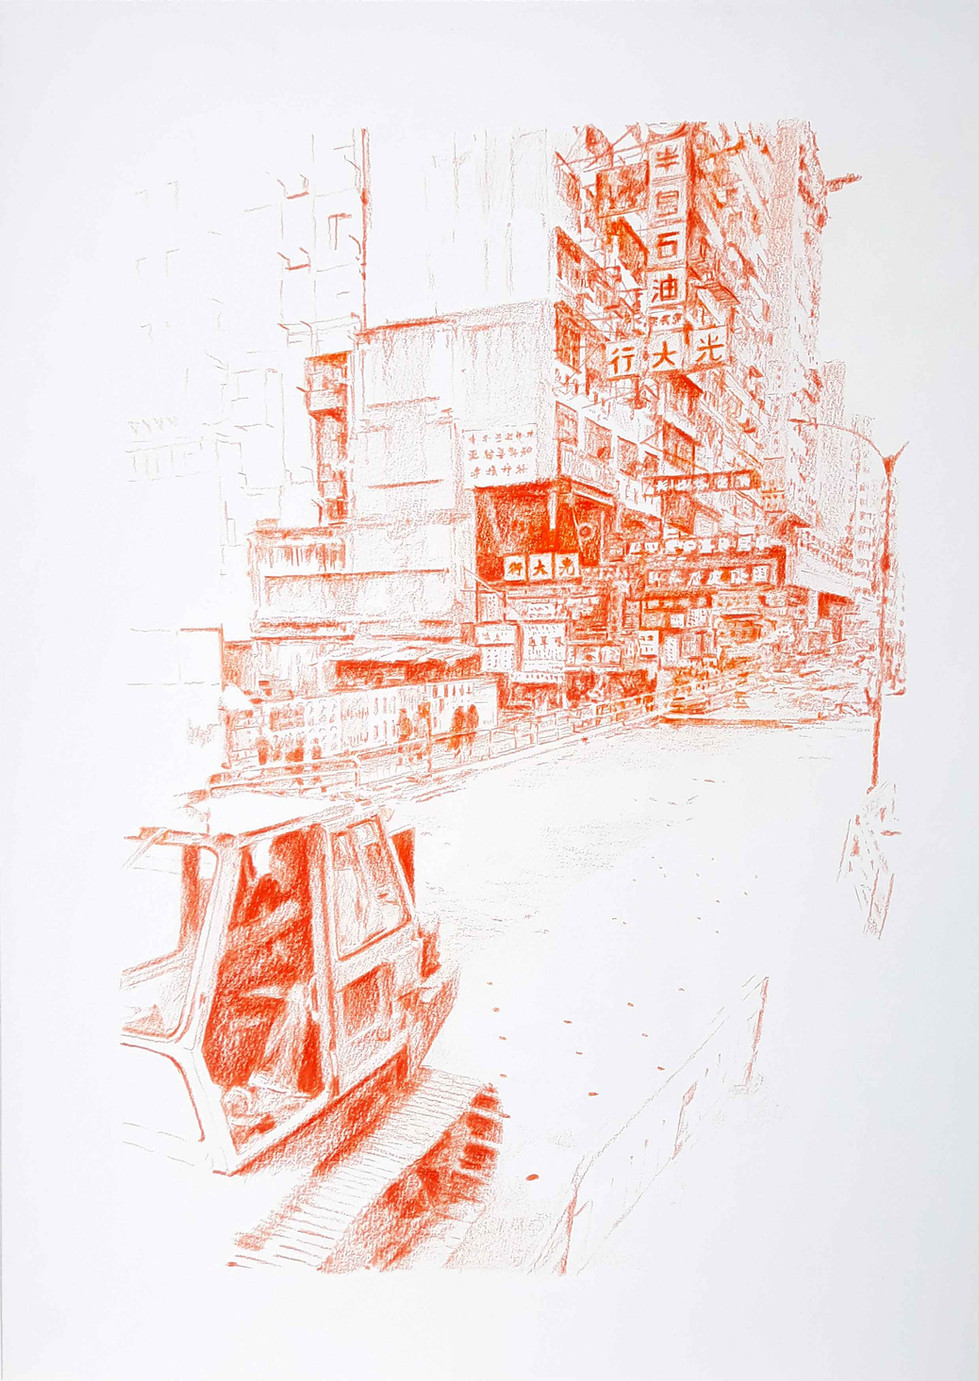 Hong kong / 14 04 2020